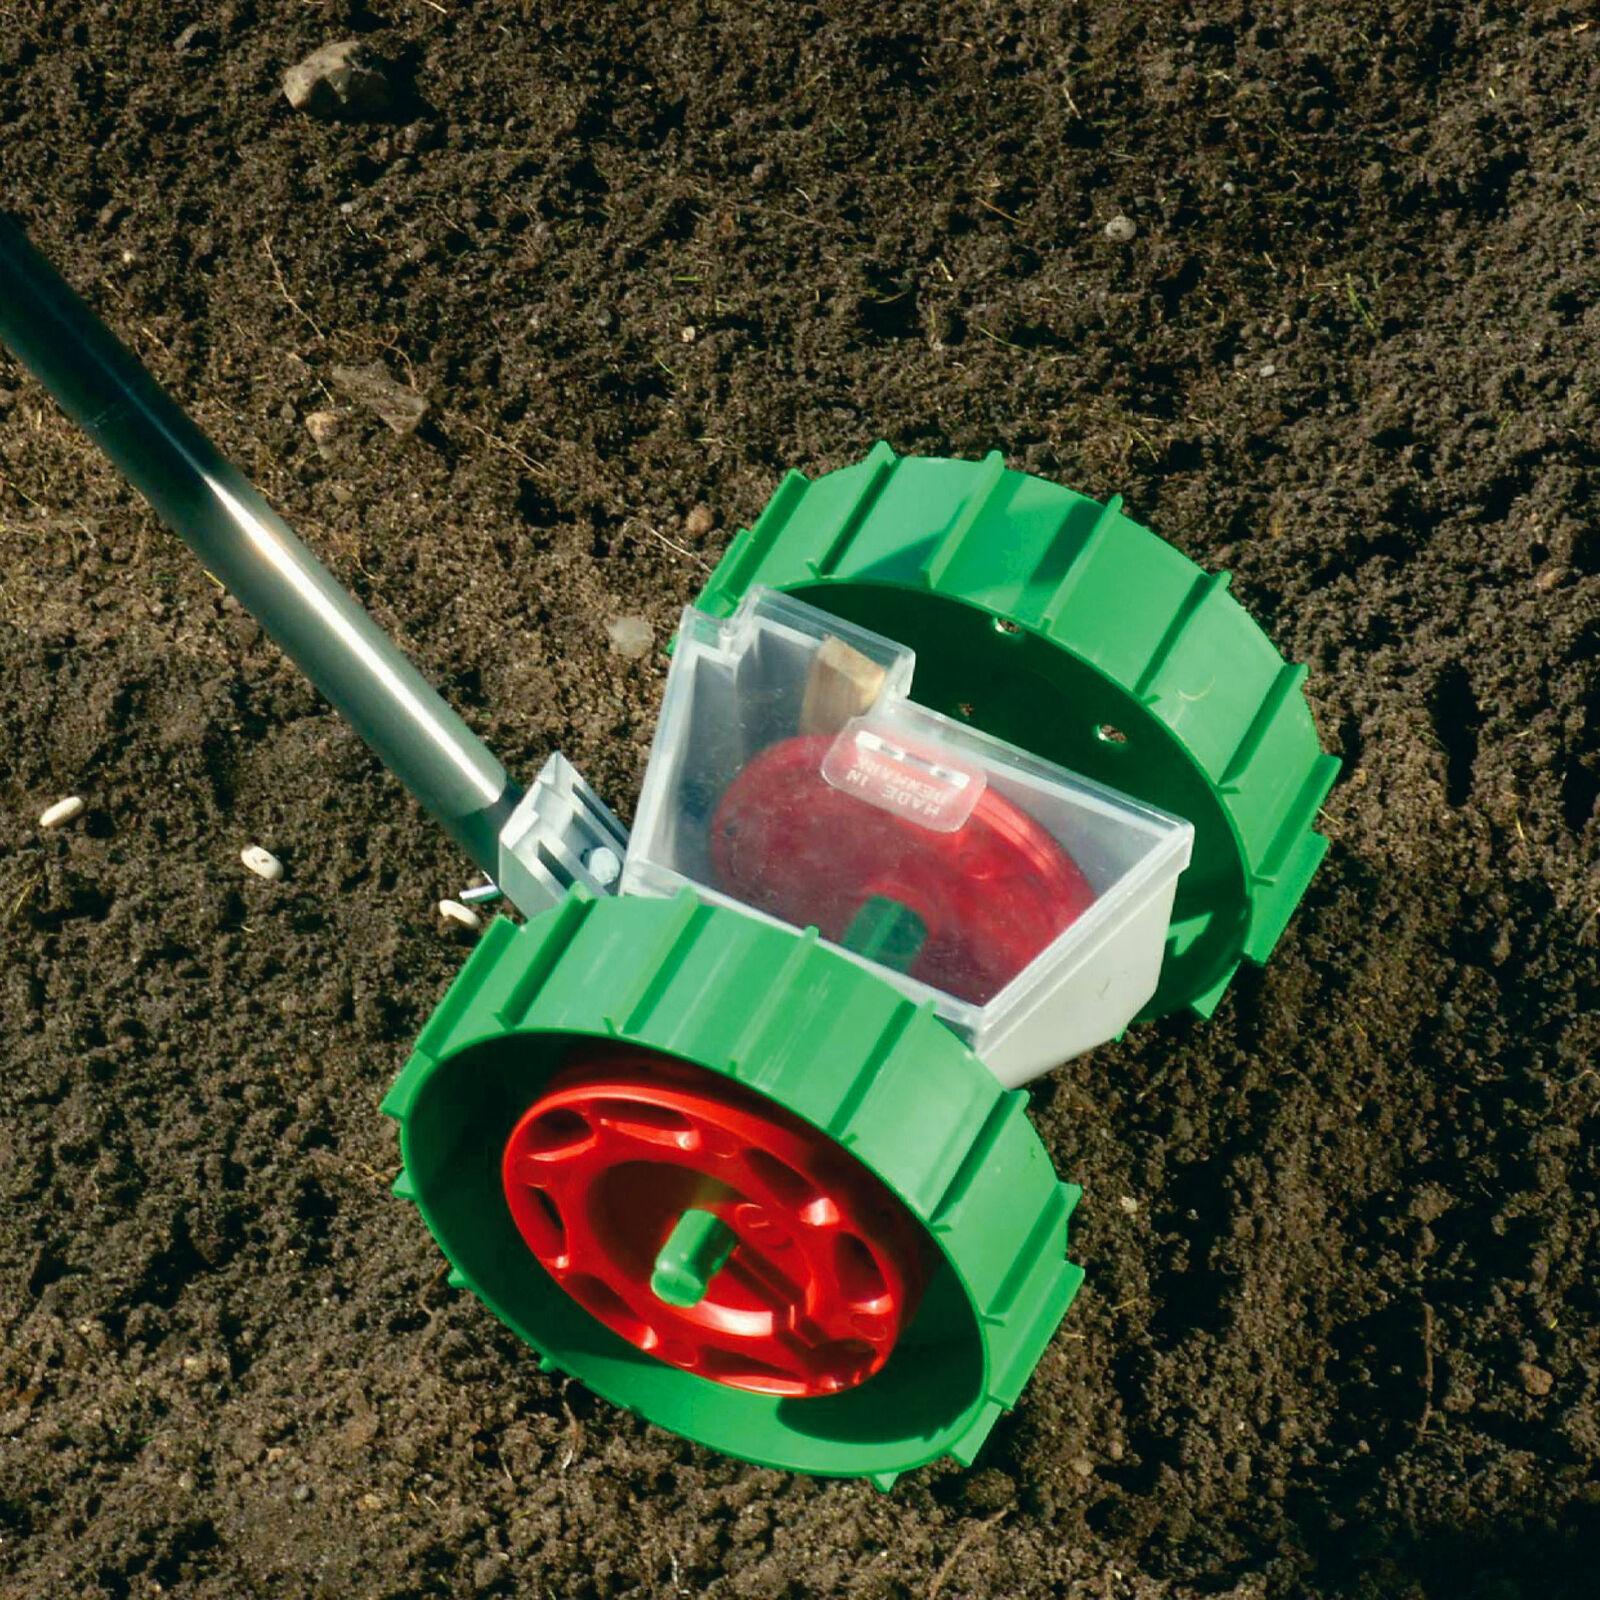 Petite Machine À Semence Bio Green Super Semoir Bg-Ss Avec 6 Disques De destiné Semoir Jardin